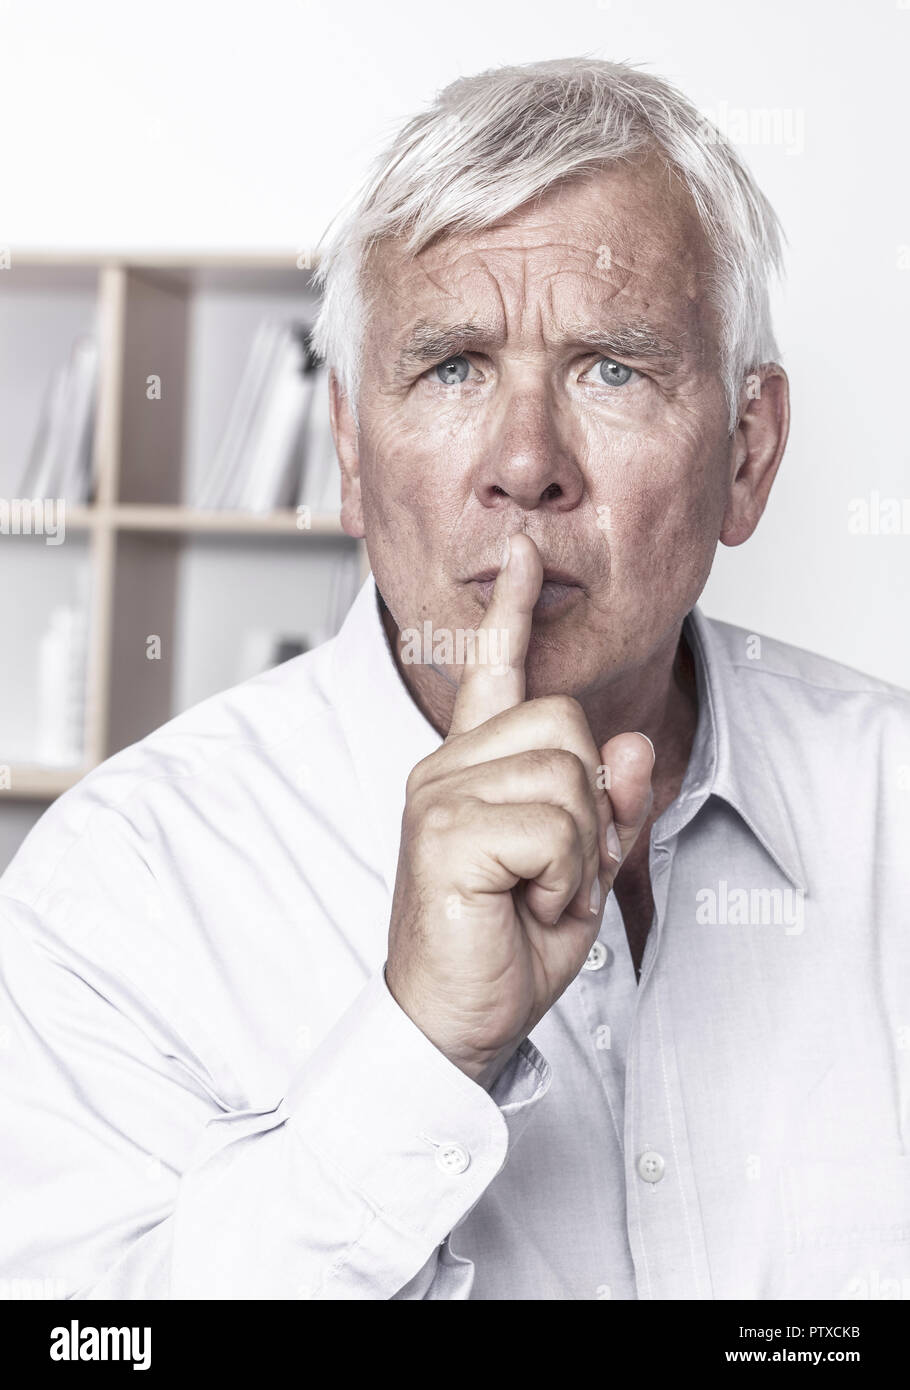 Senior Mit Gestik Finger Vor Dem Mund (Model-Release) Stockbild